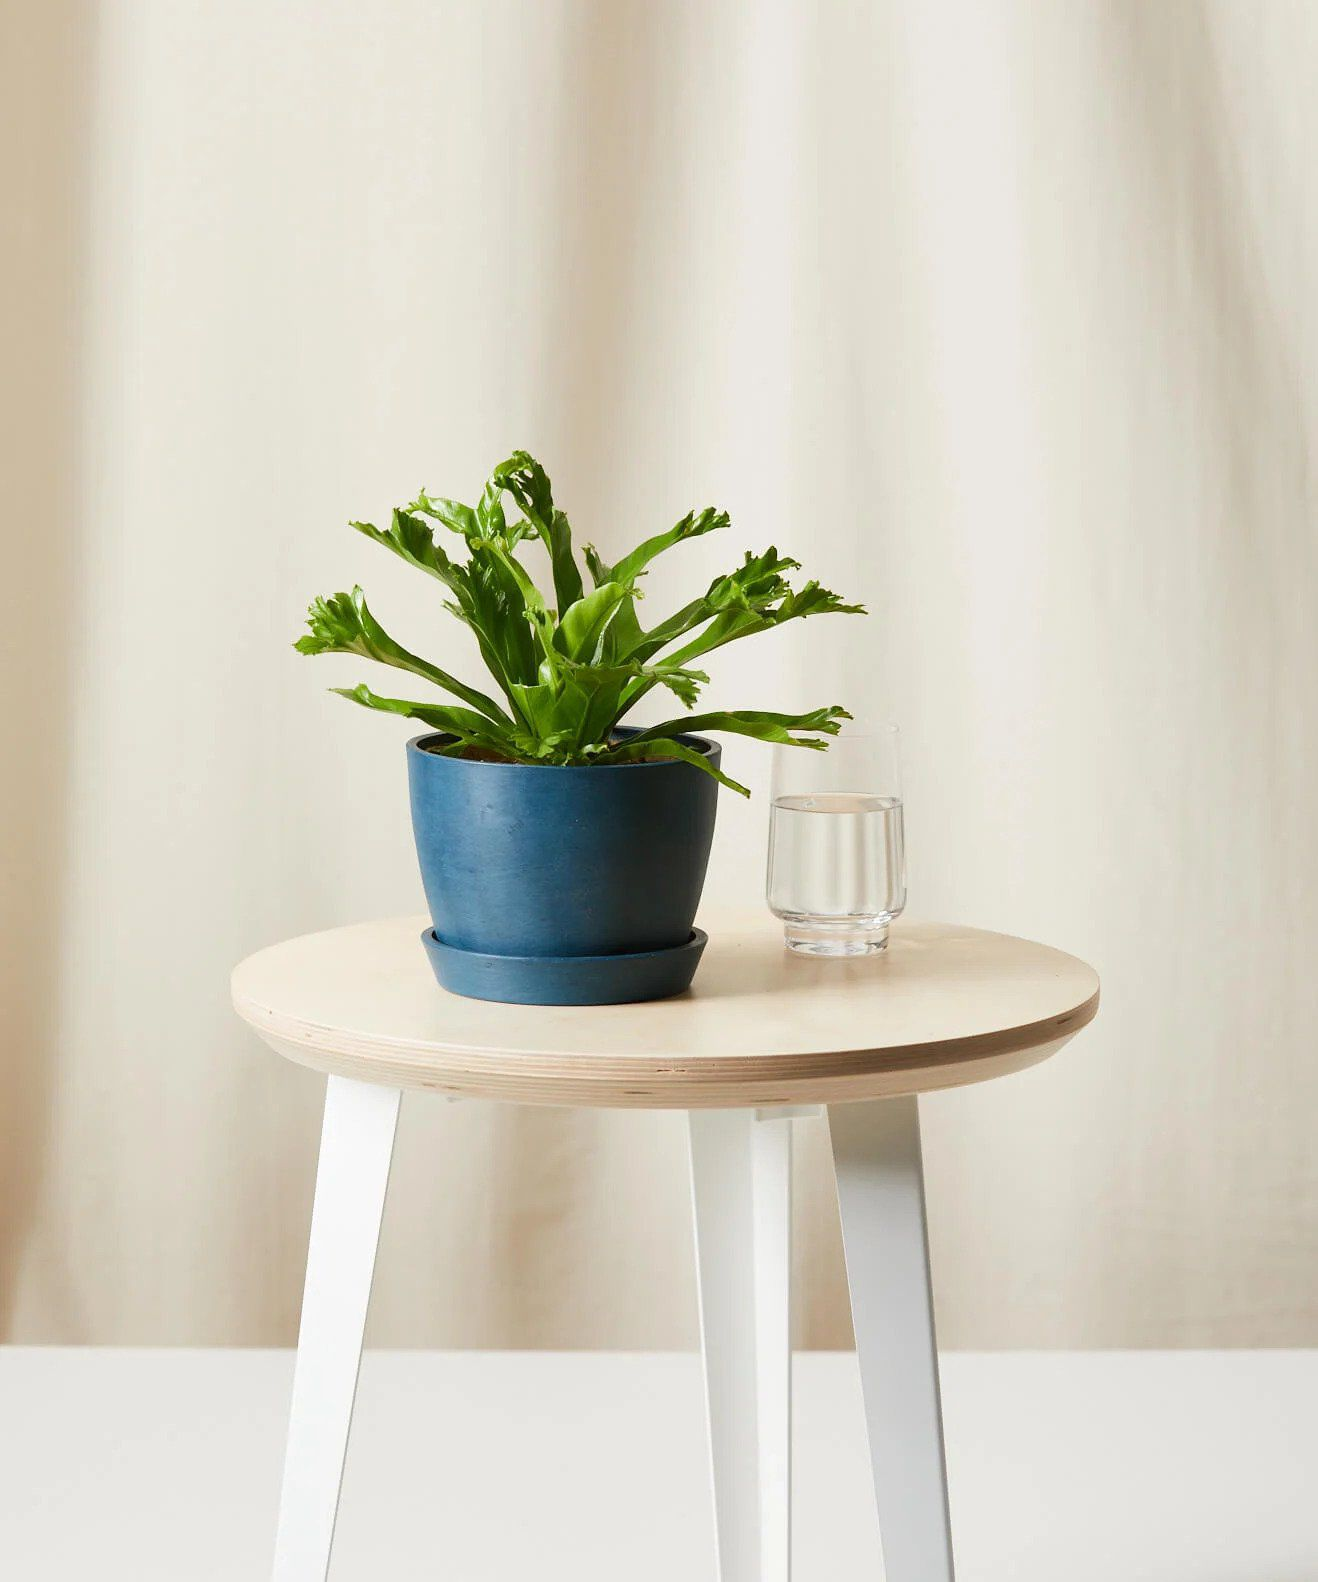 houseplants safe for cats: bird's nest fern